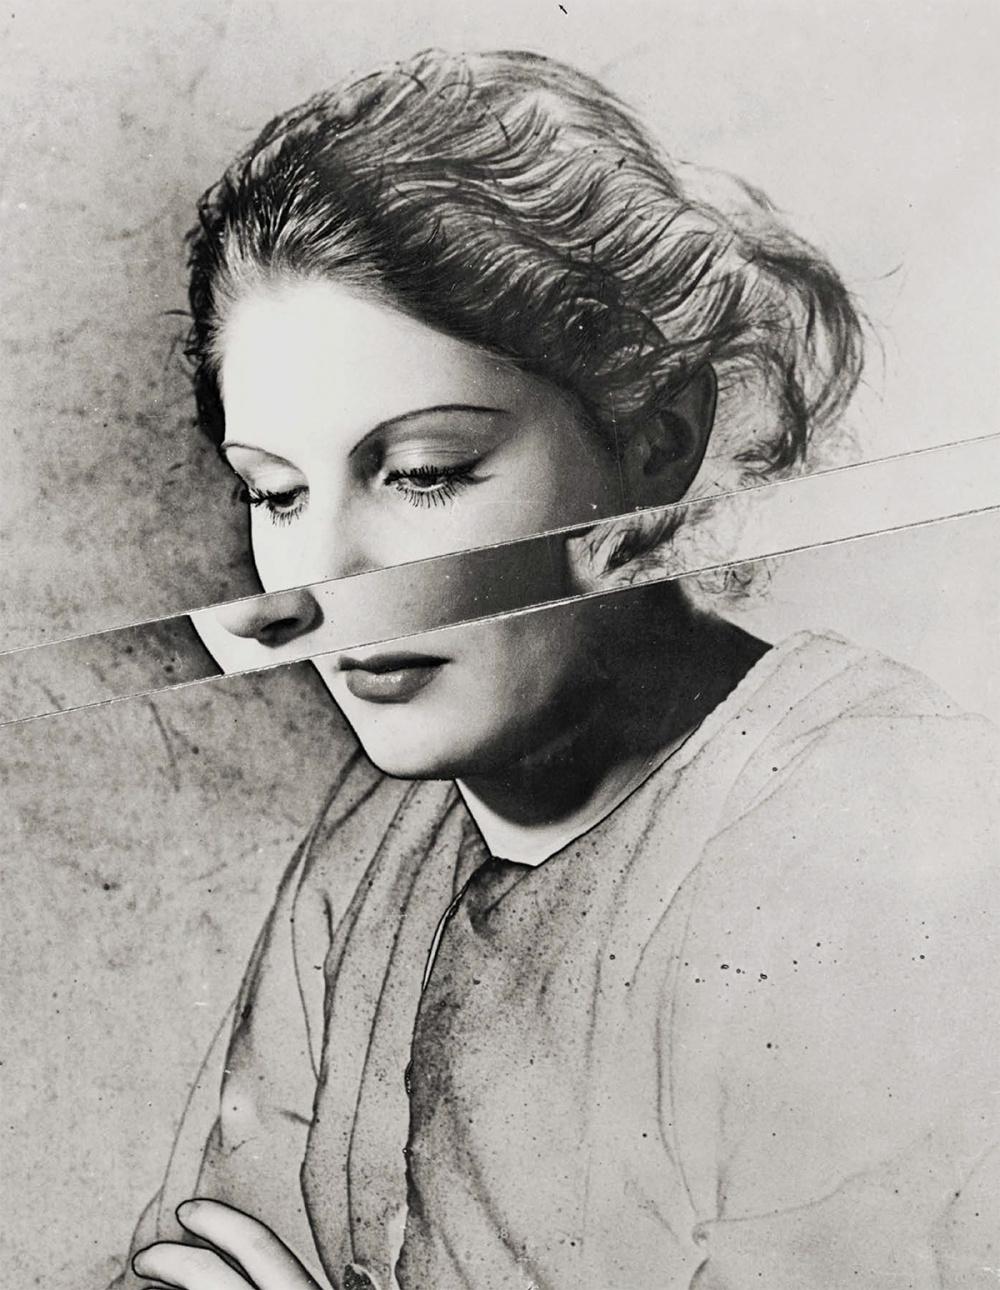 Erwin Blumenfeld, Portrait Solarised and Cut, circa 1938. Silver gelatin print, 13 × 10.5